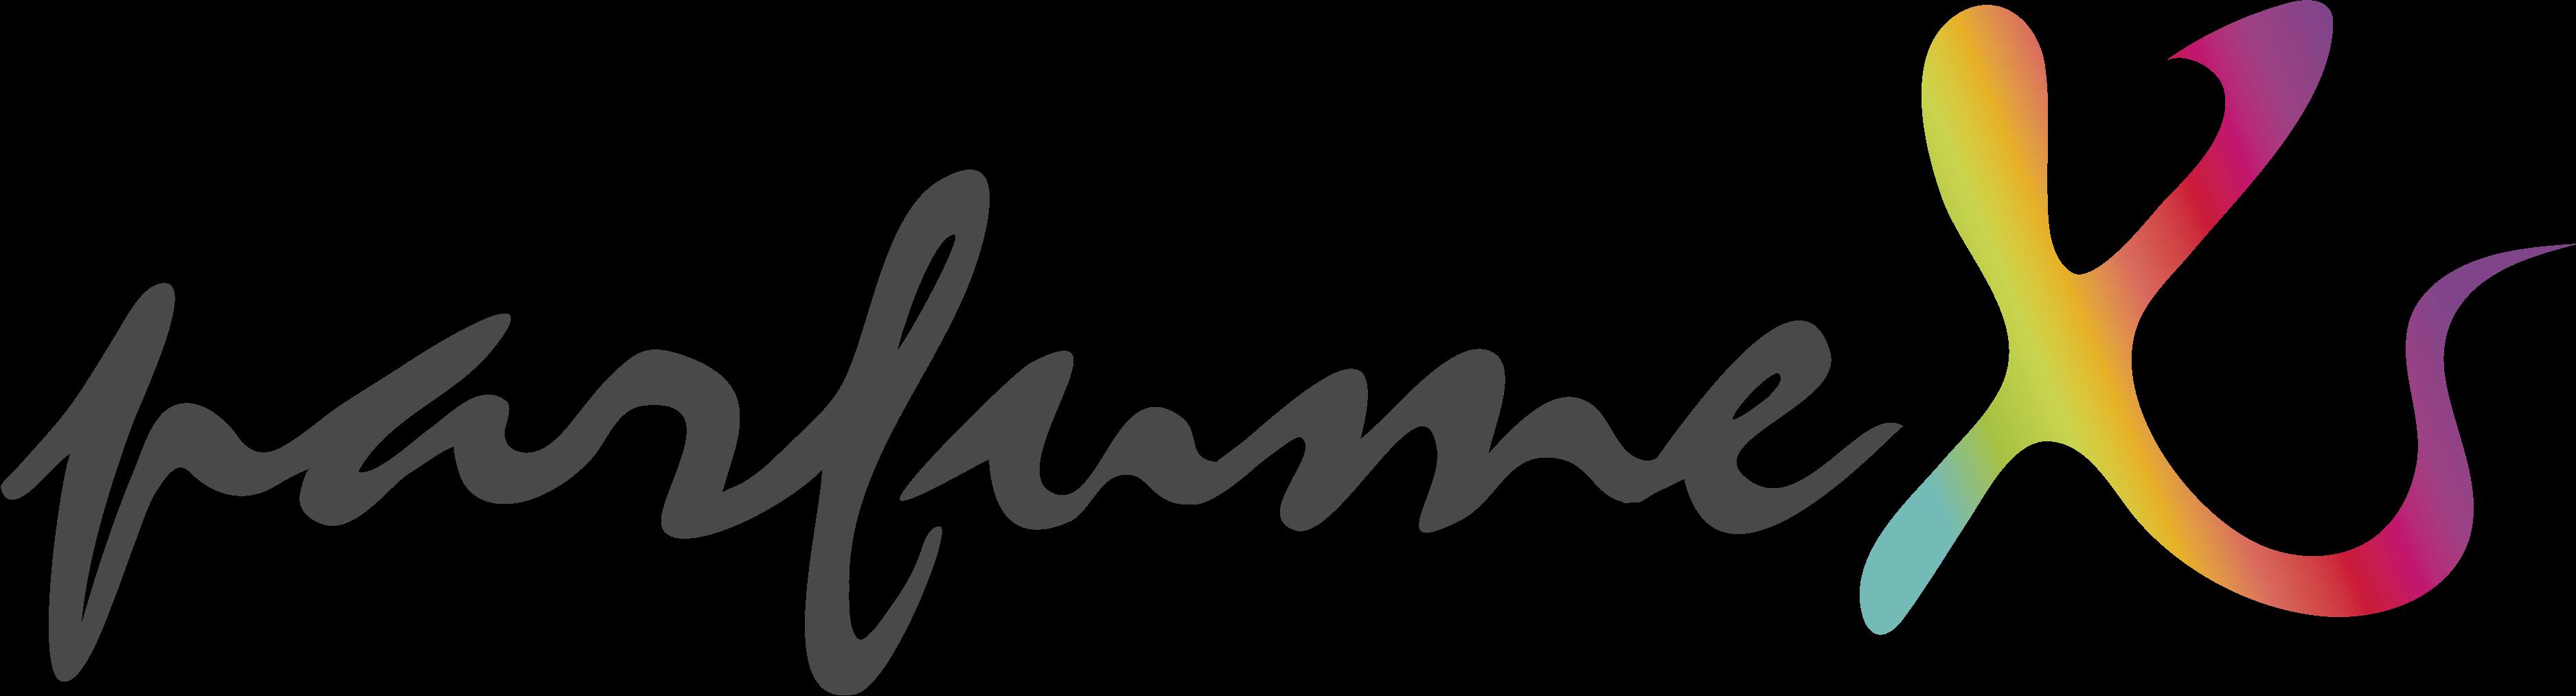 parfumeX-派美香氛| 香氛| 空间香氛| 香氛营销| 免费香氛设计